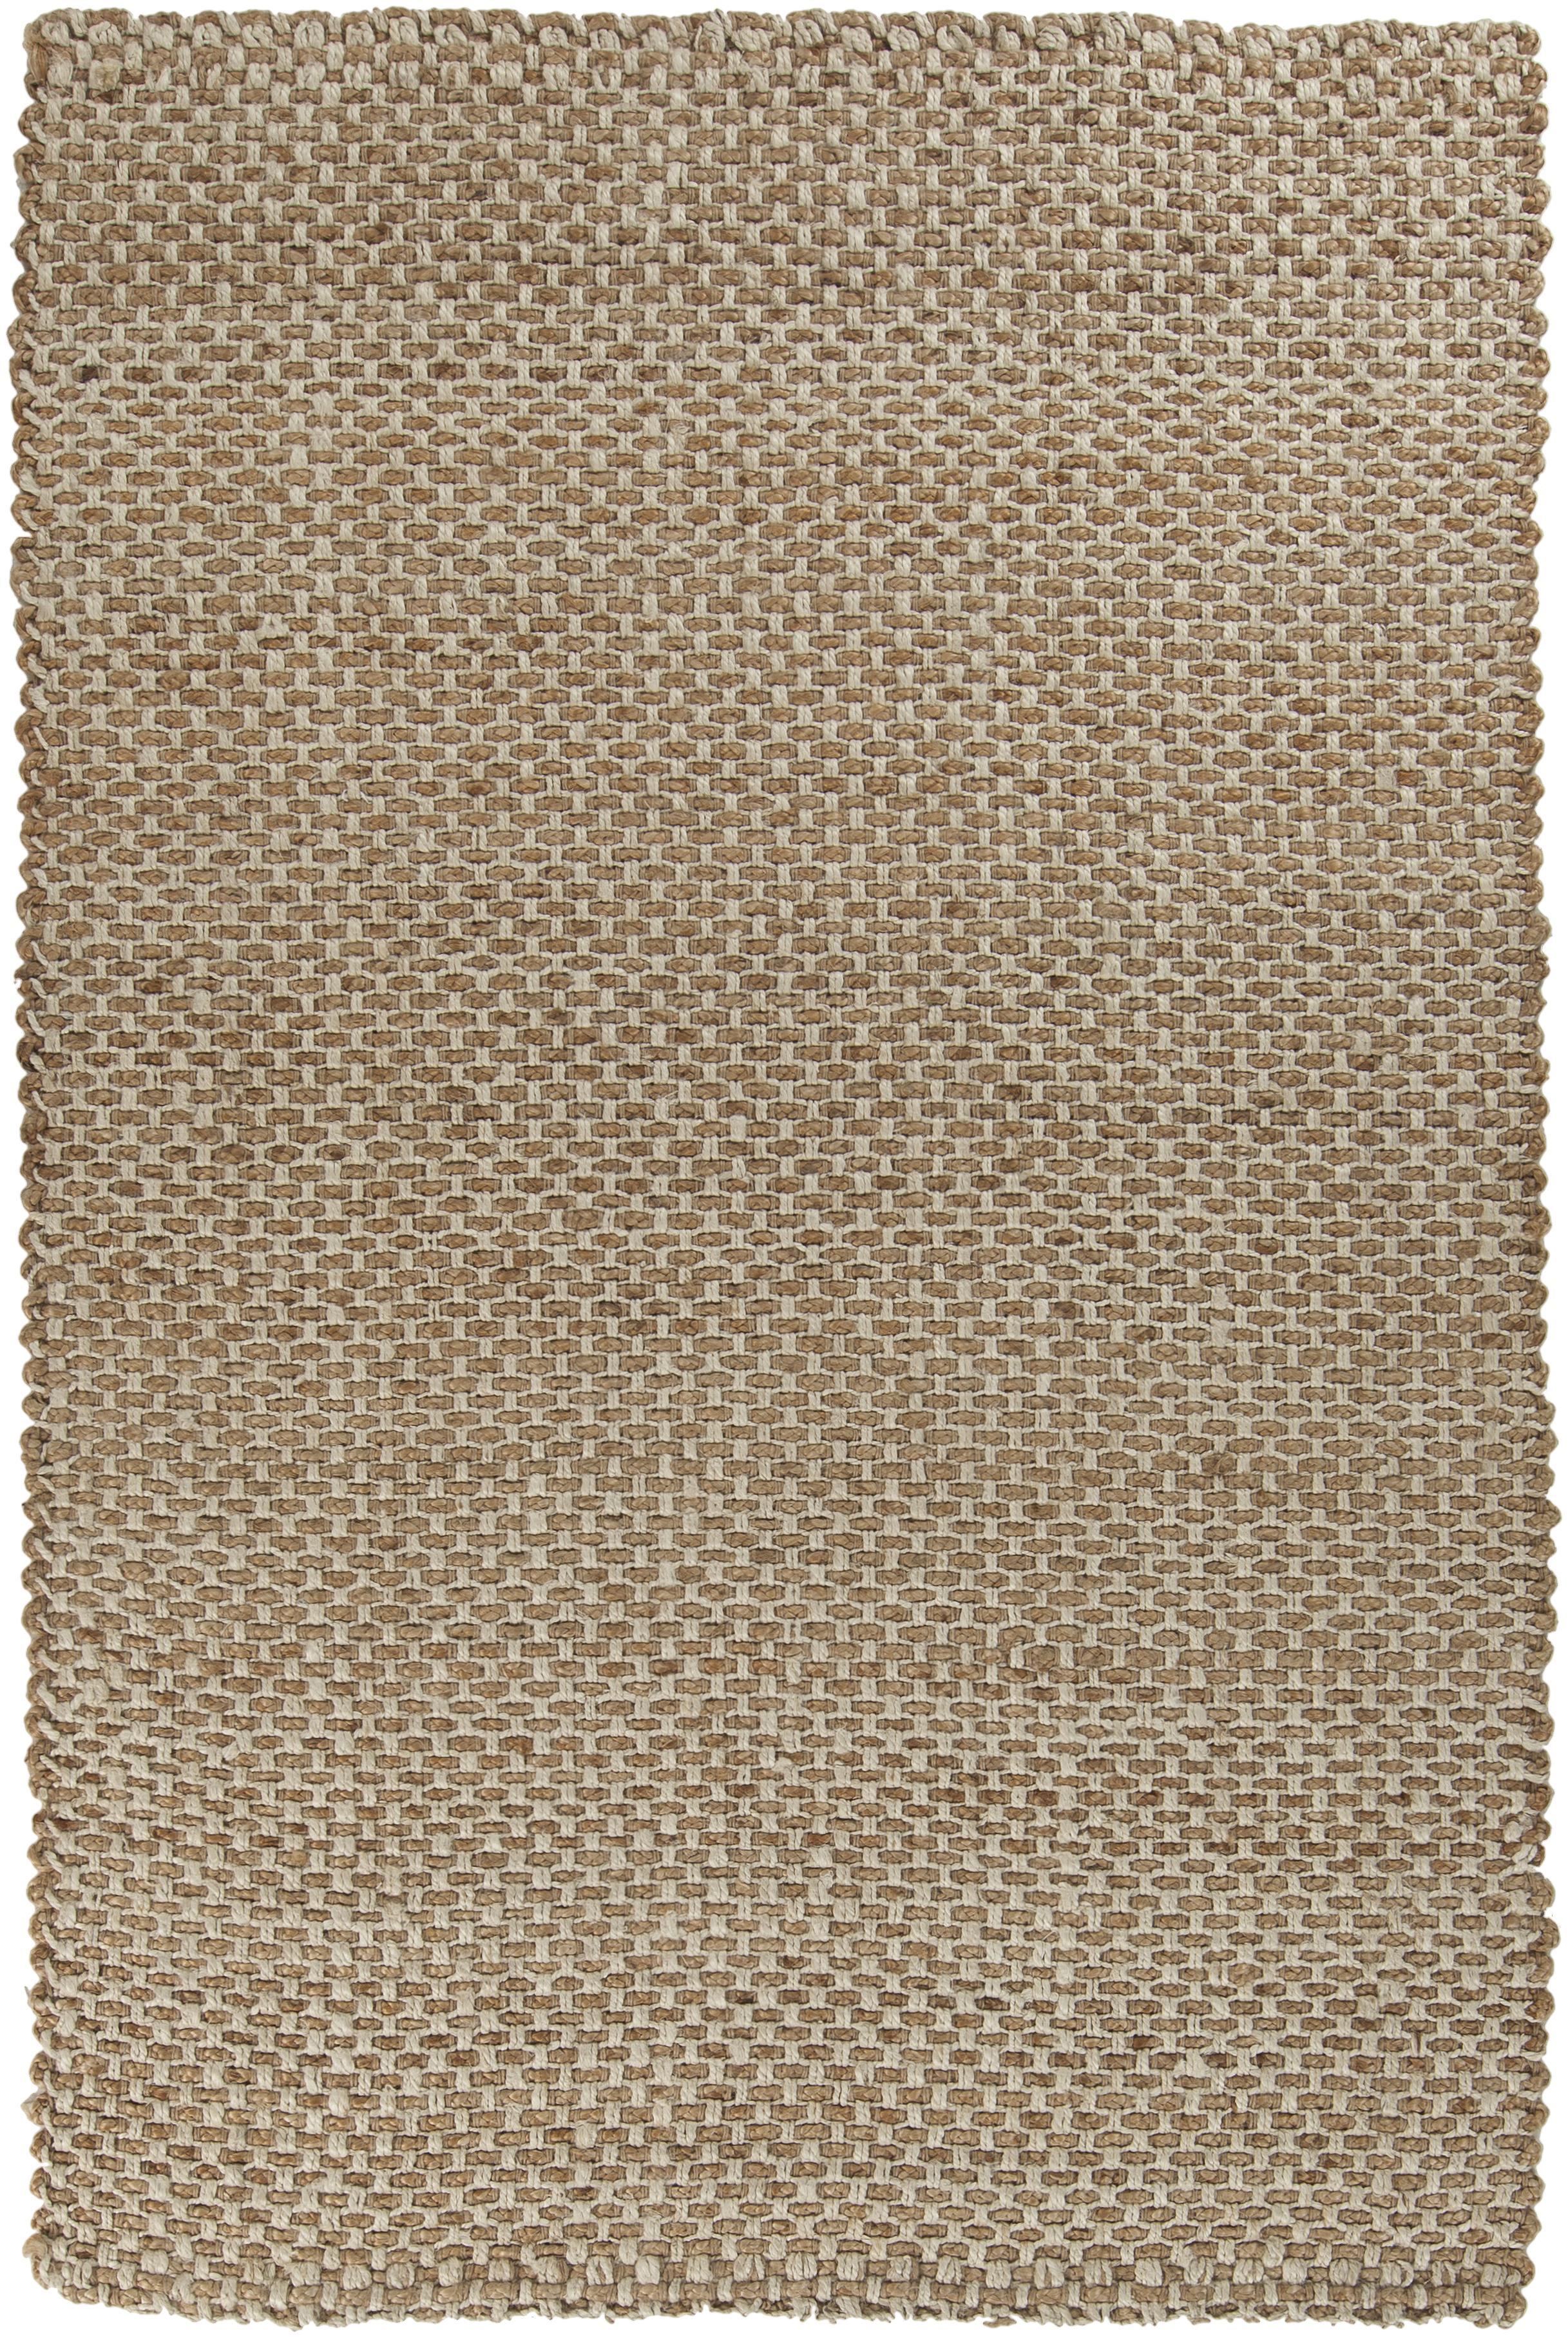 Reeds 10' x 14' by 9596 at Becker Furniture